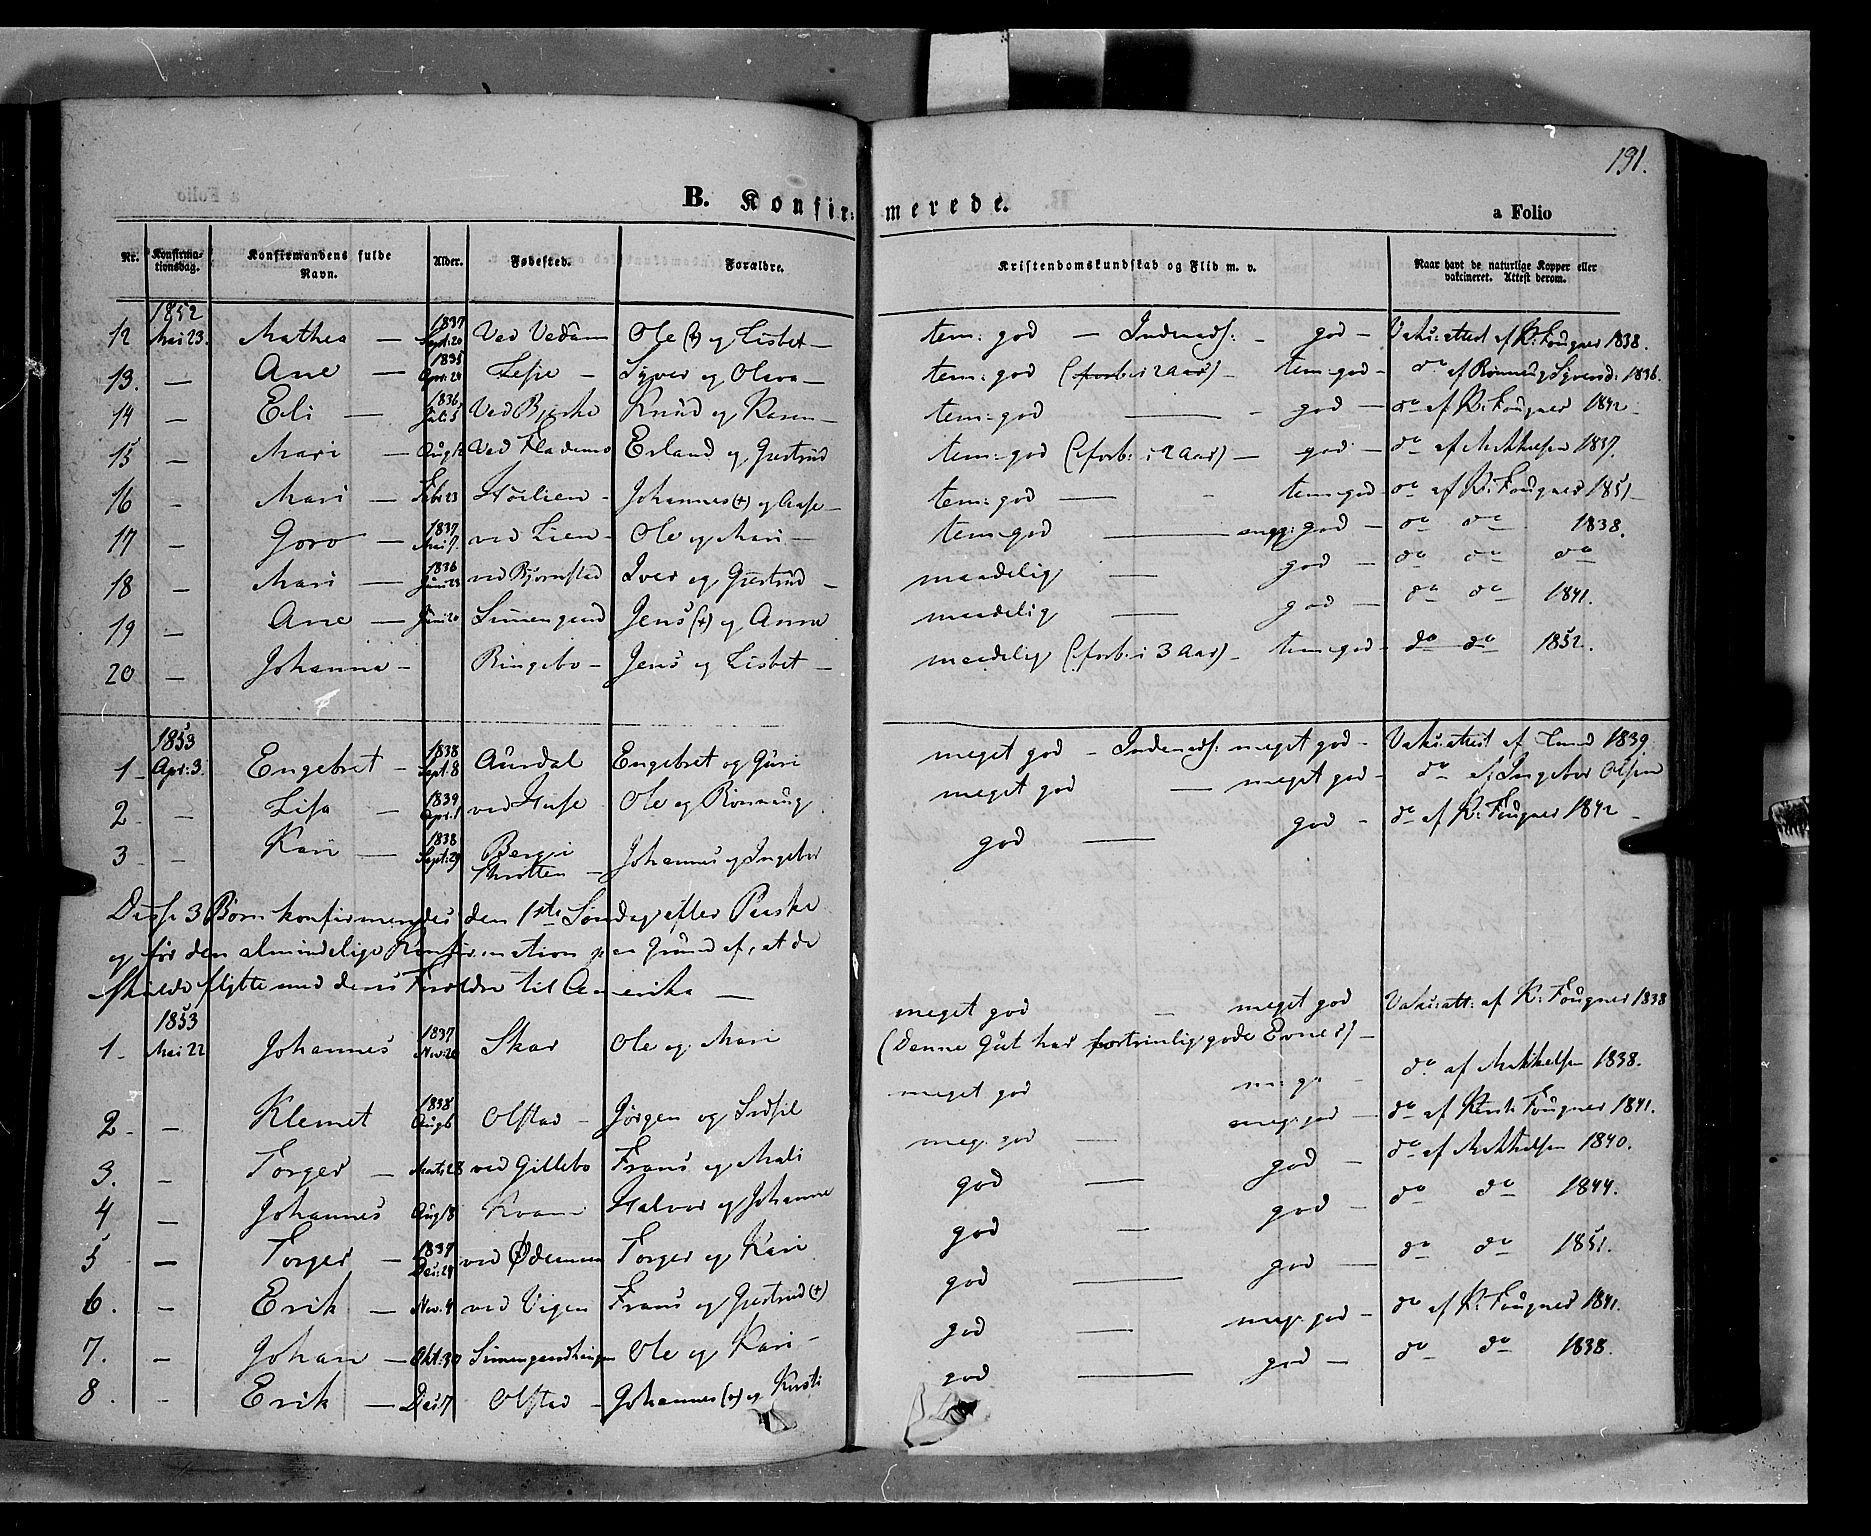 SAH, Øyer prestekontor, Ministerialbok nr. 5, 1842-1857, s. 191